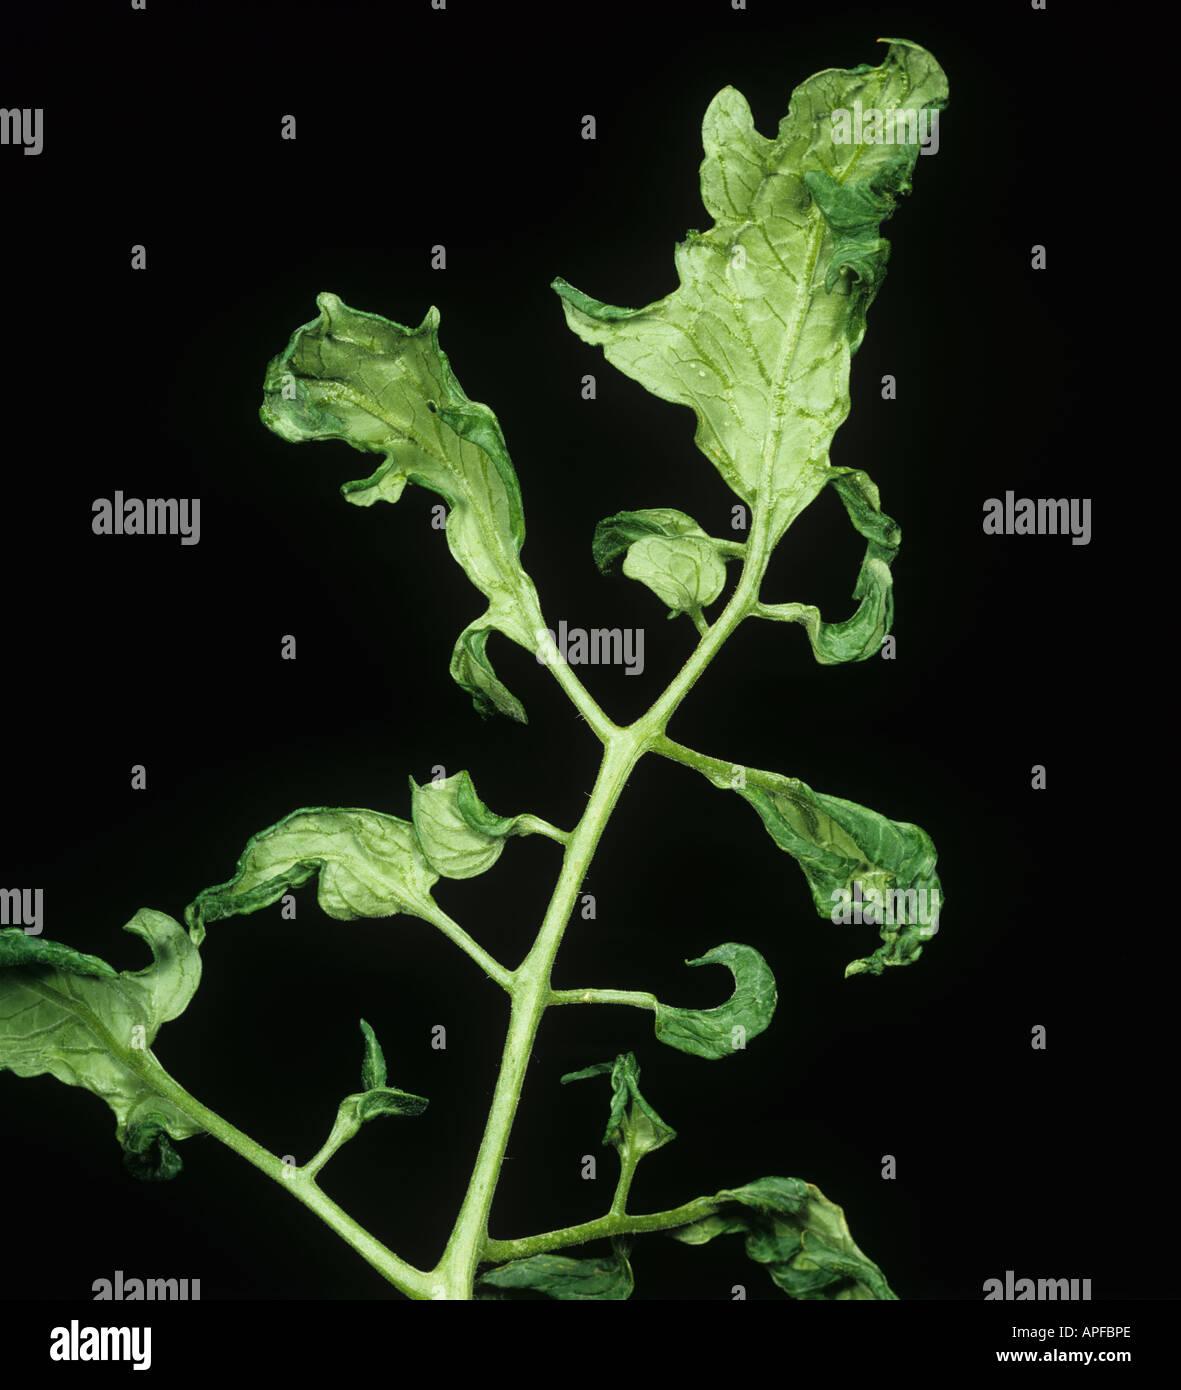 Fern leaf a sympton of cucumber mosaic virus on tomato - Stock Image